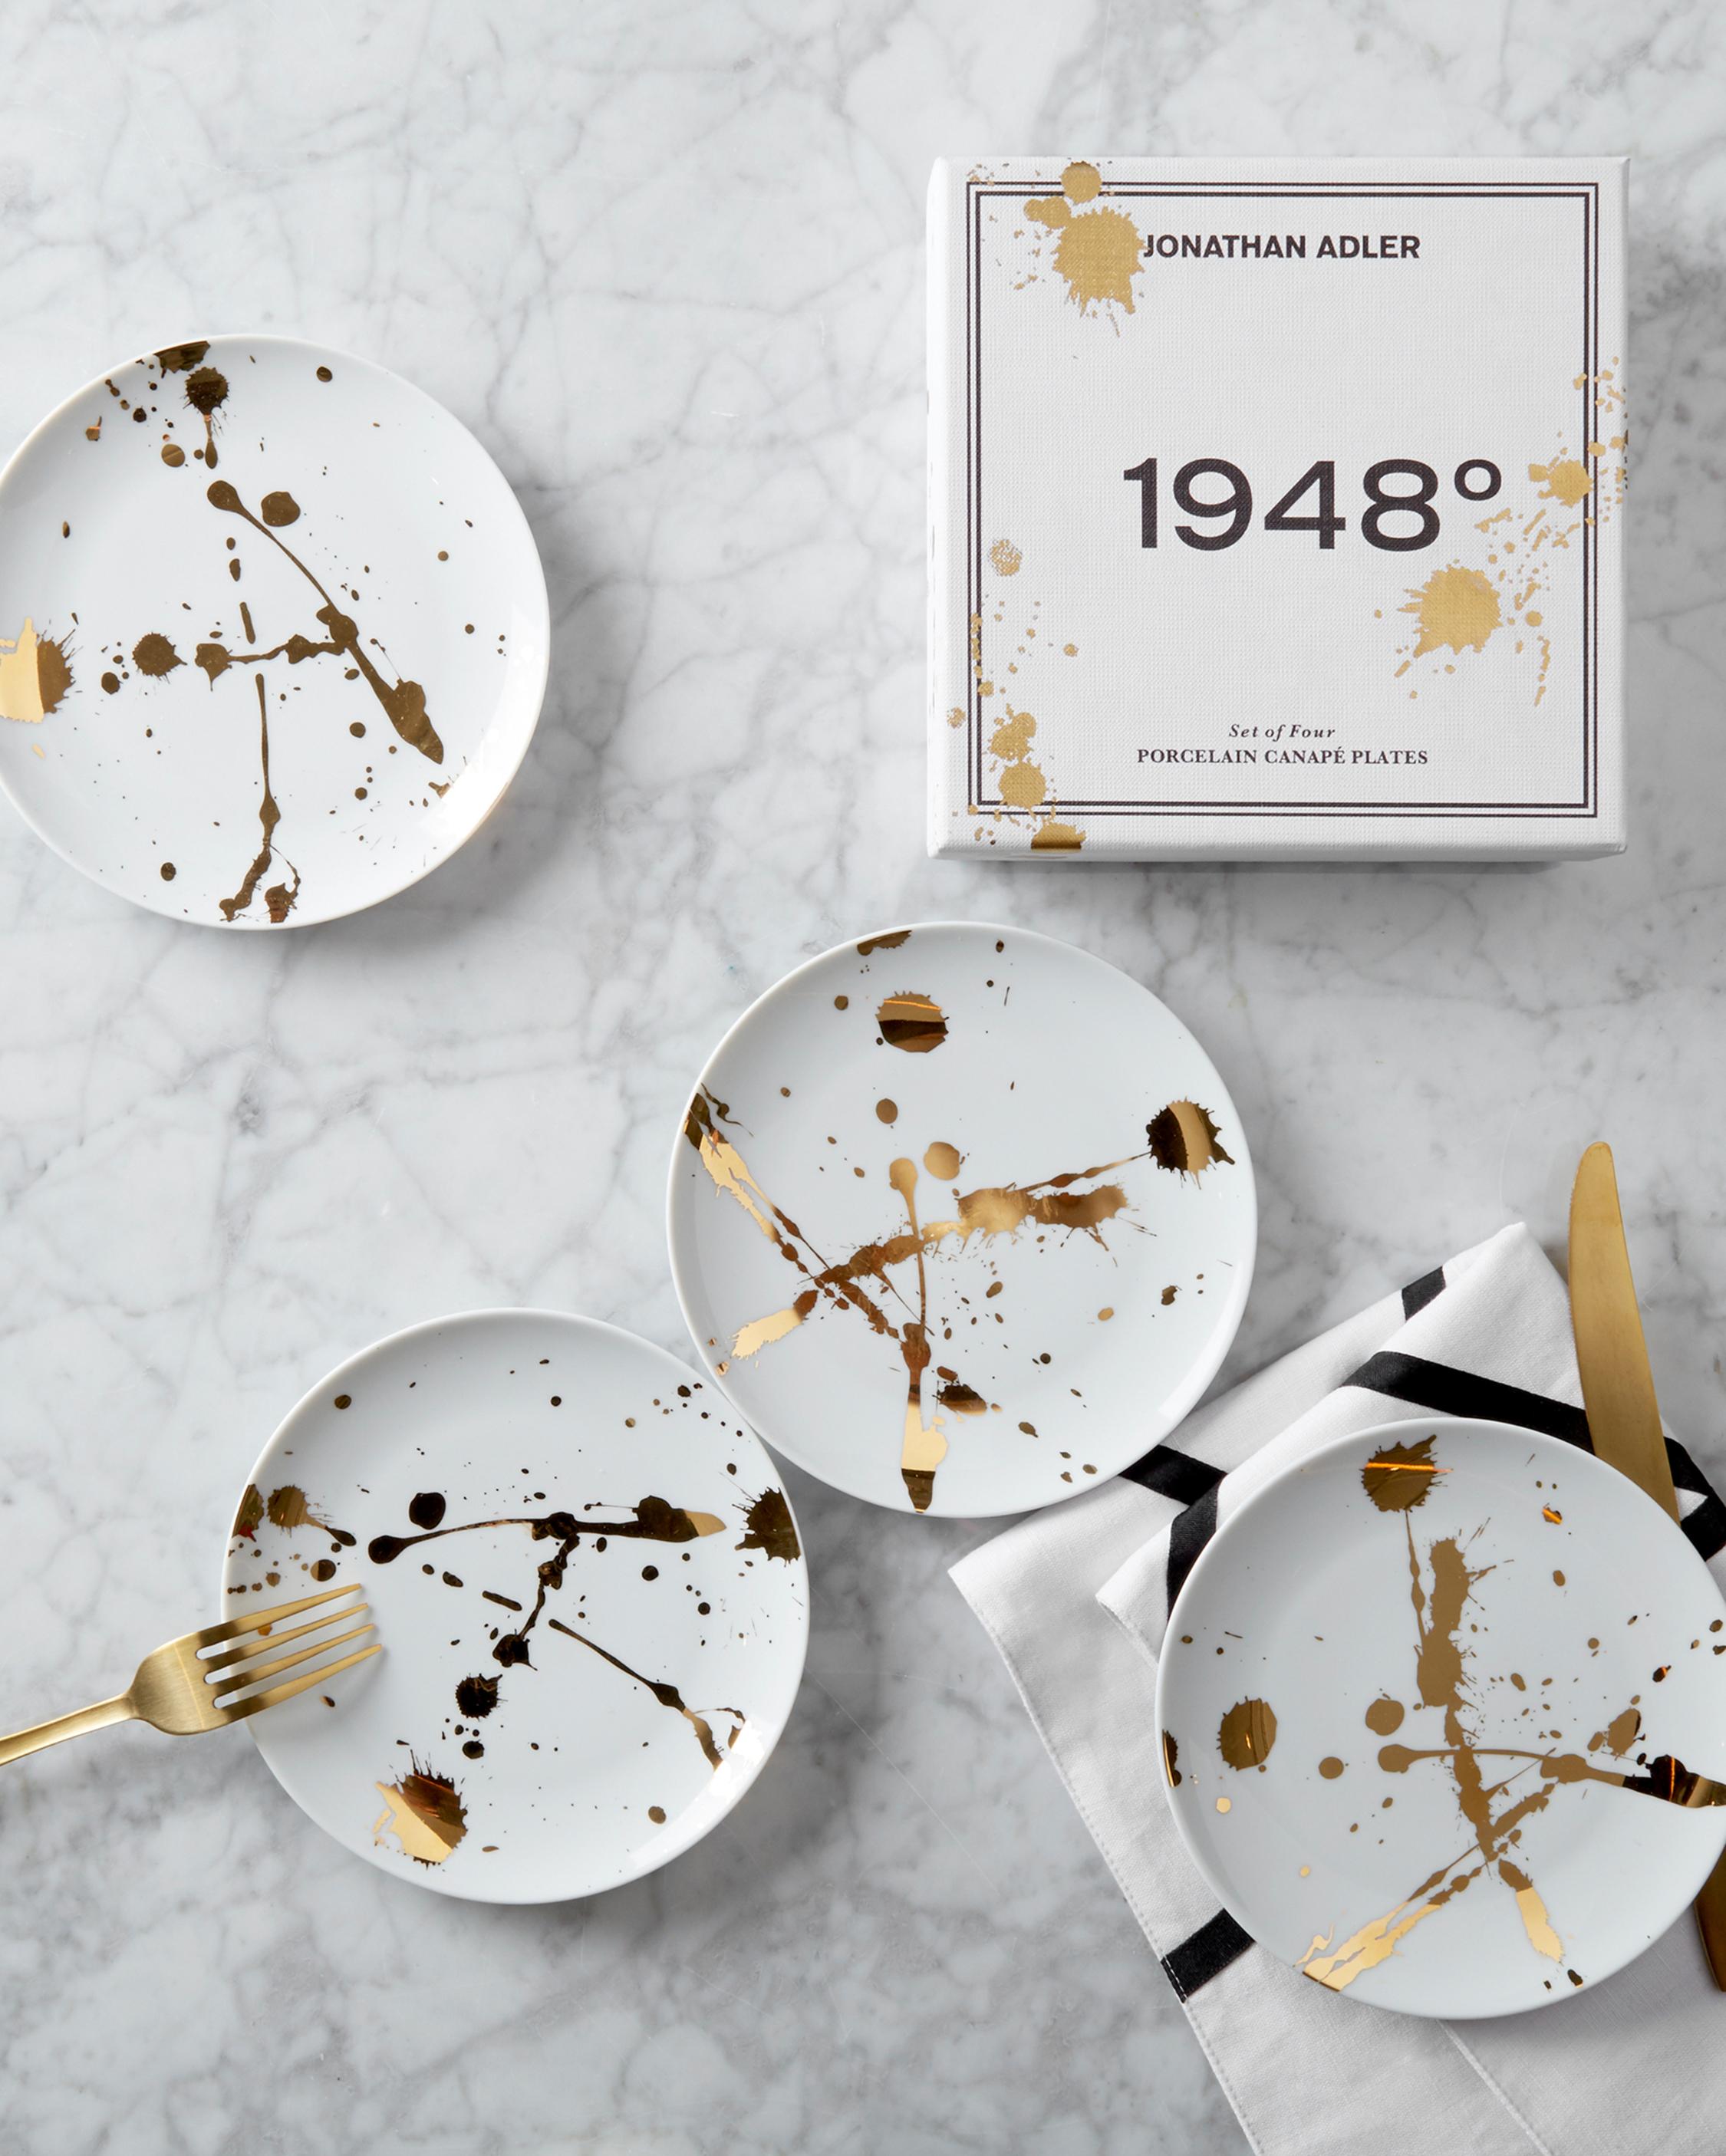 Jonathan Adler 1948° Canape Plate Set 2